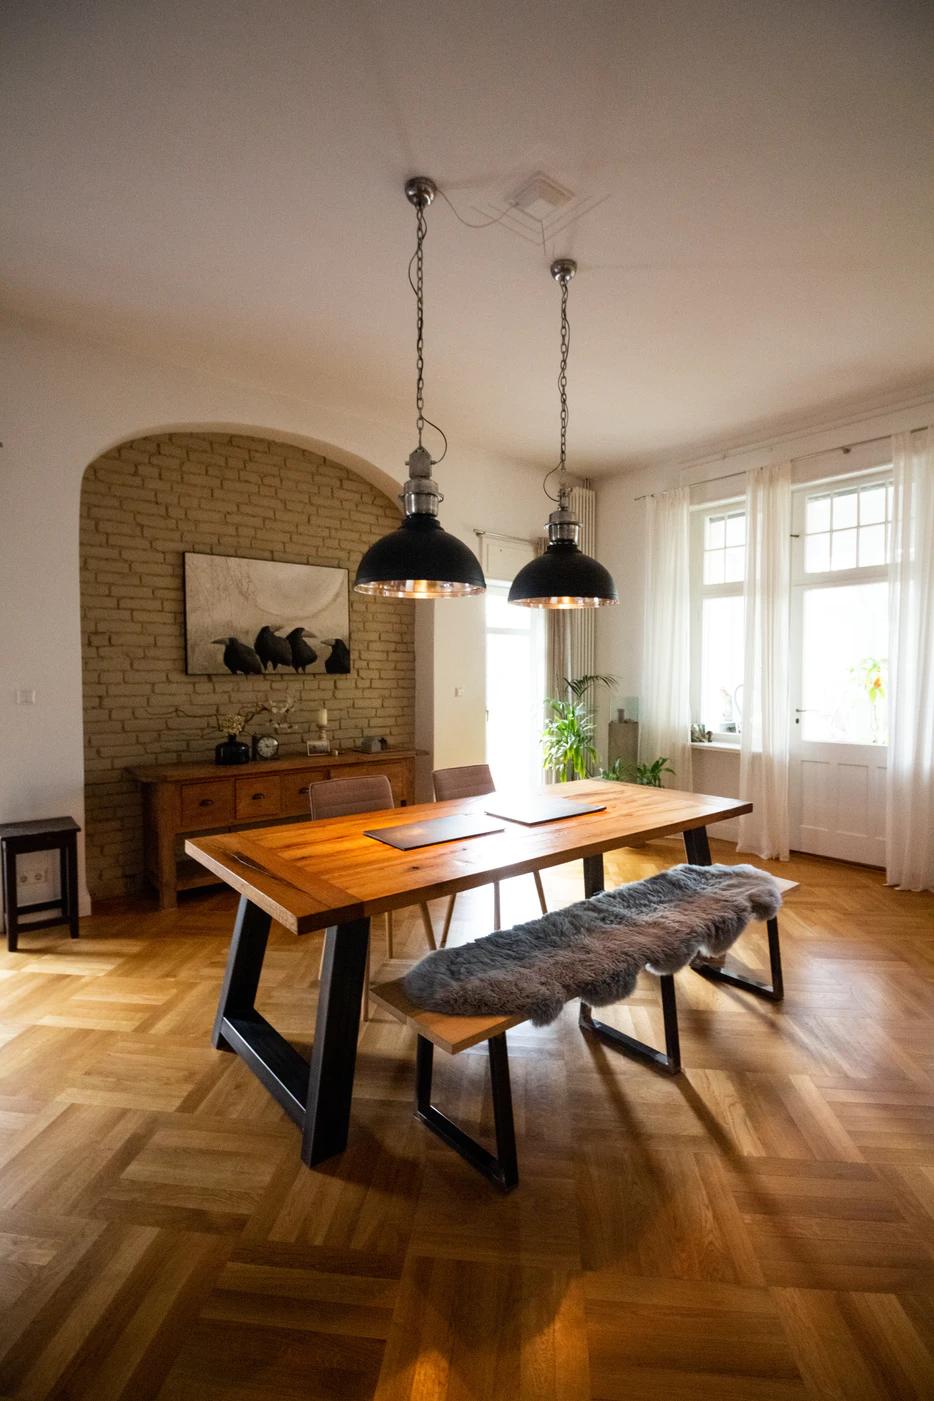 Big light fixtures atop a roomy dining room